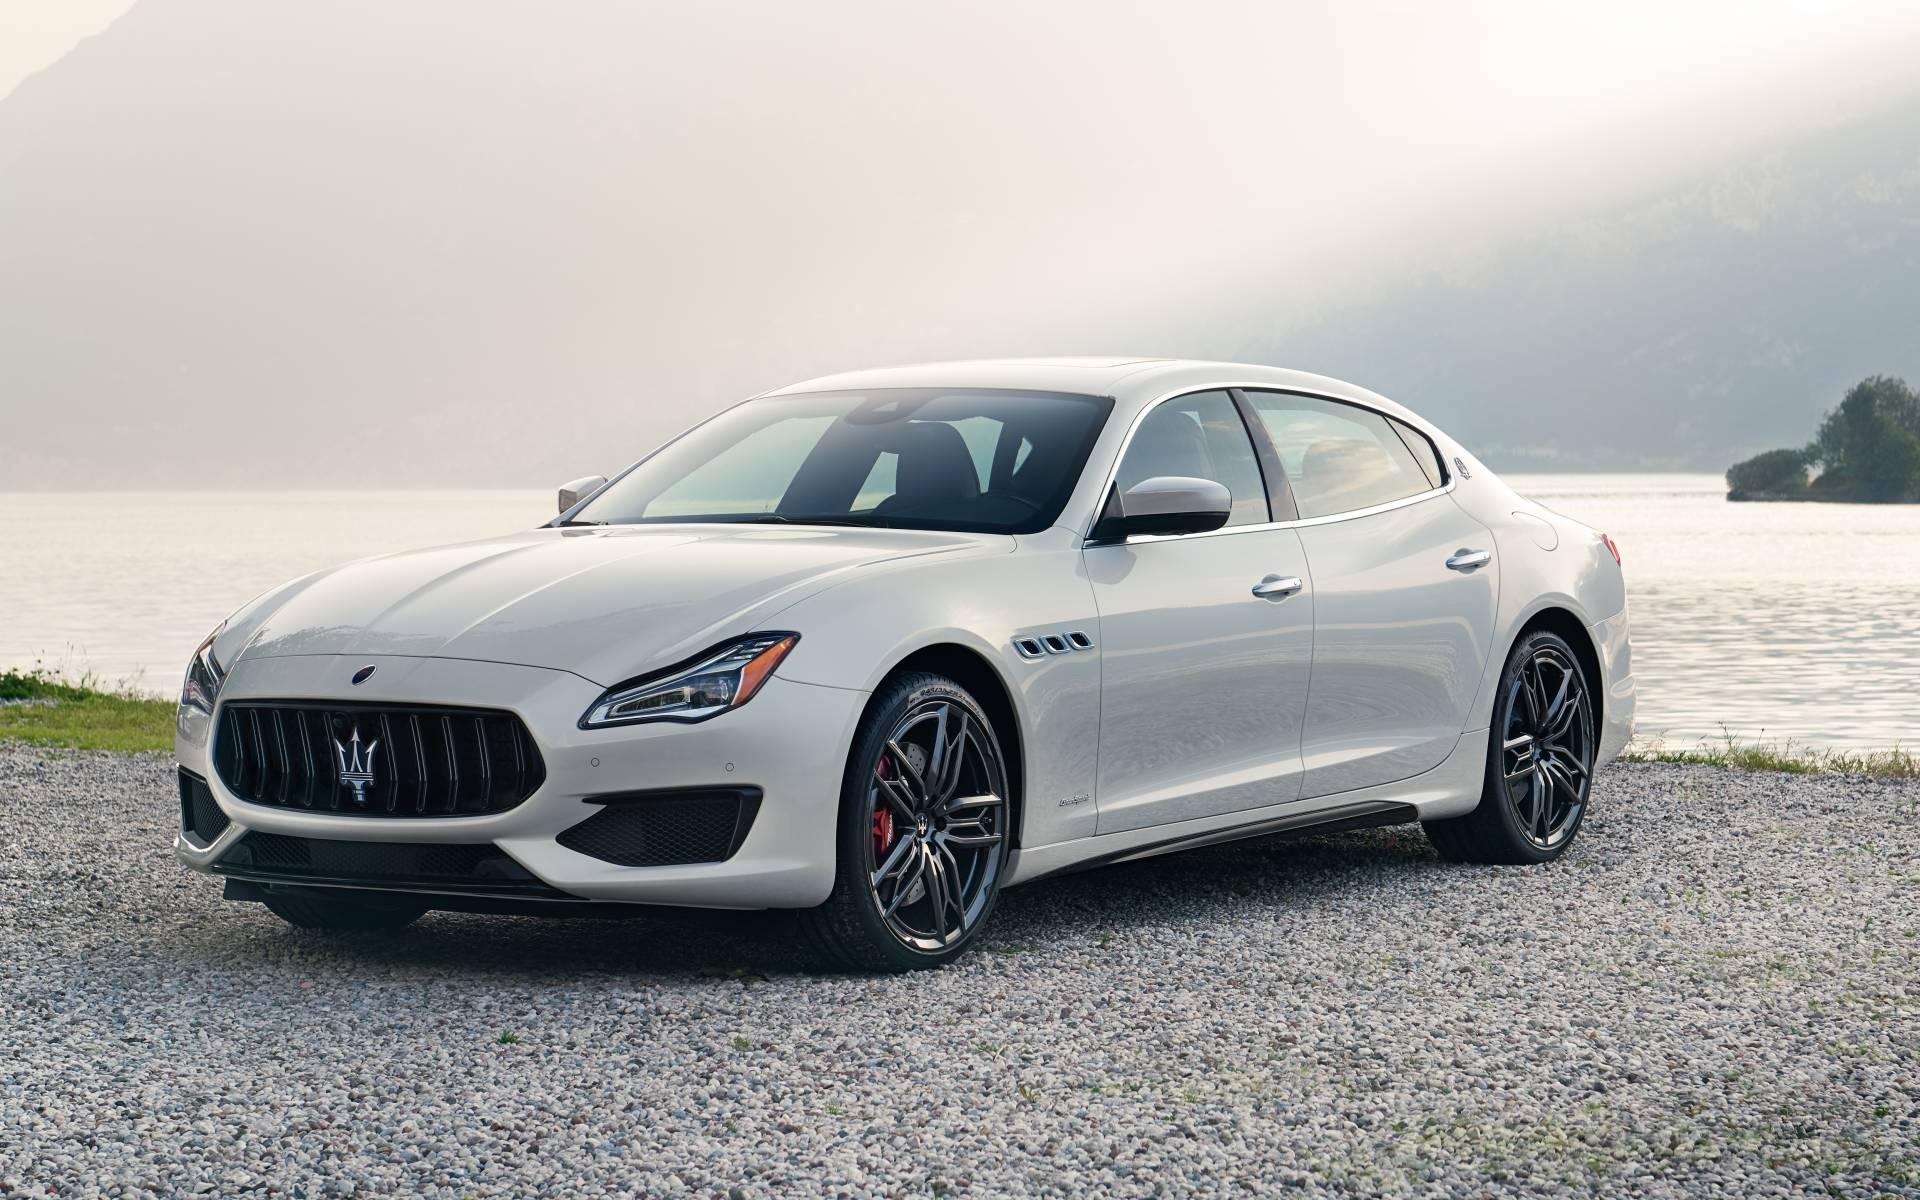 2020 Maserati Quattroportes Performance